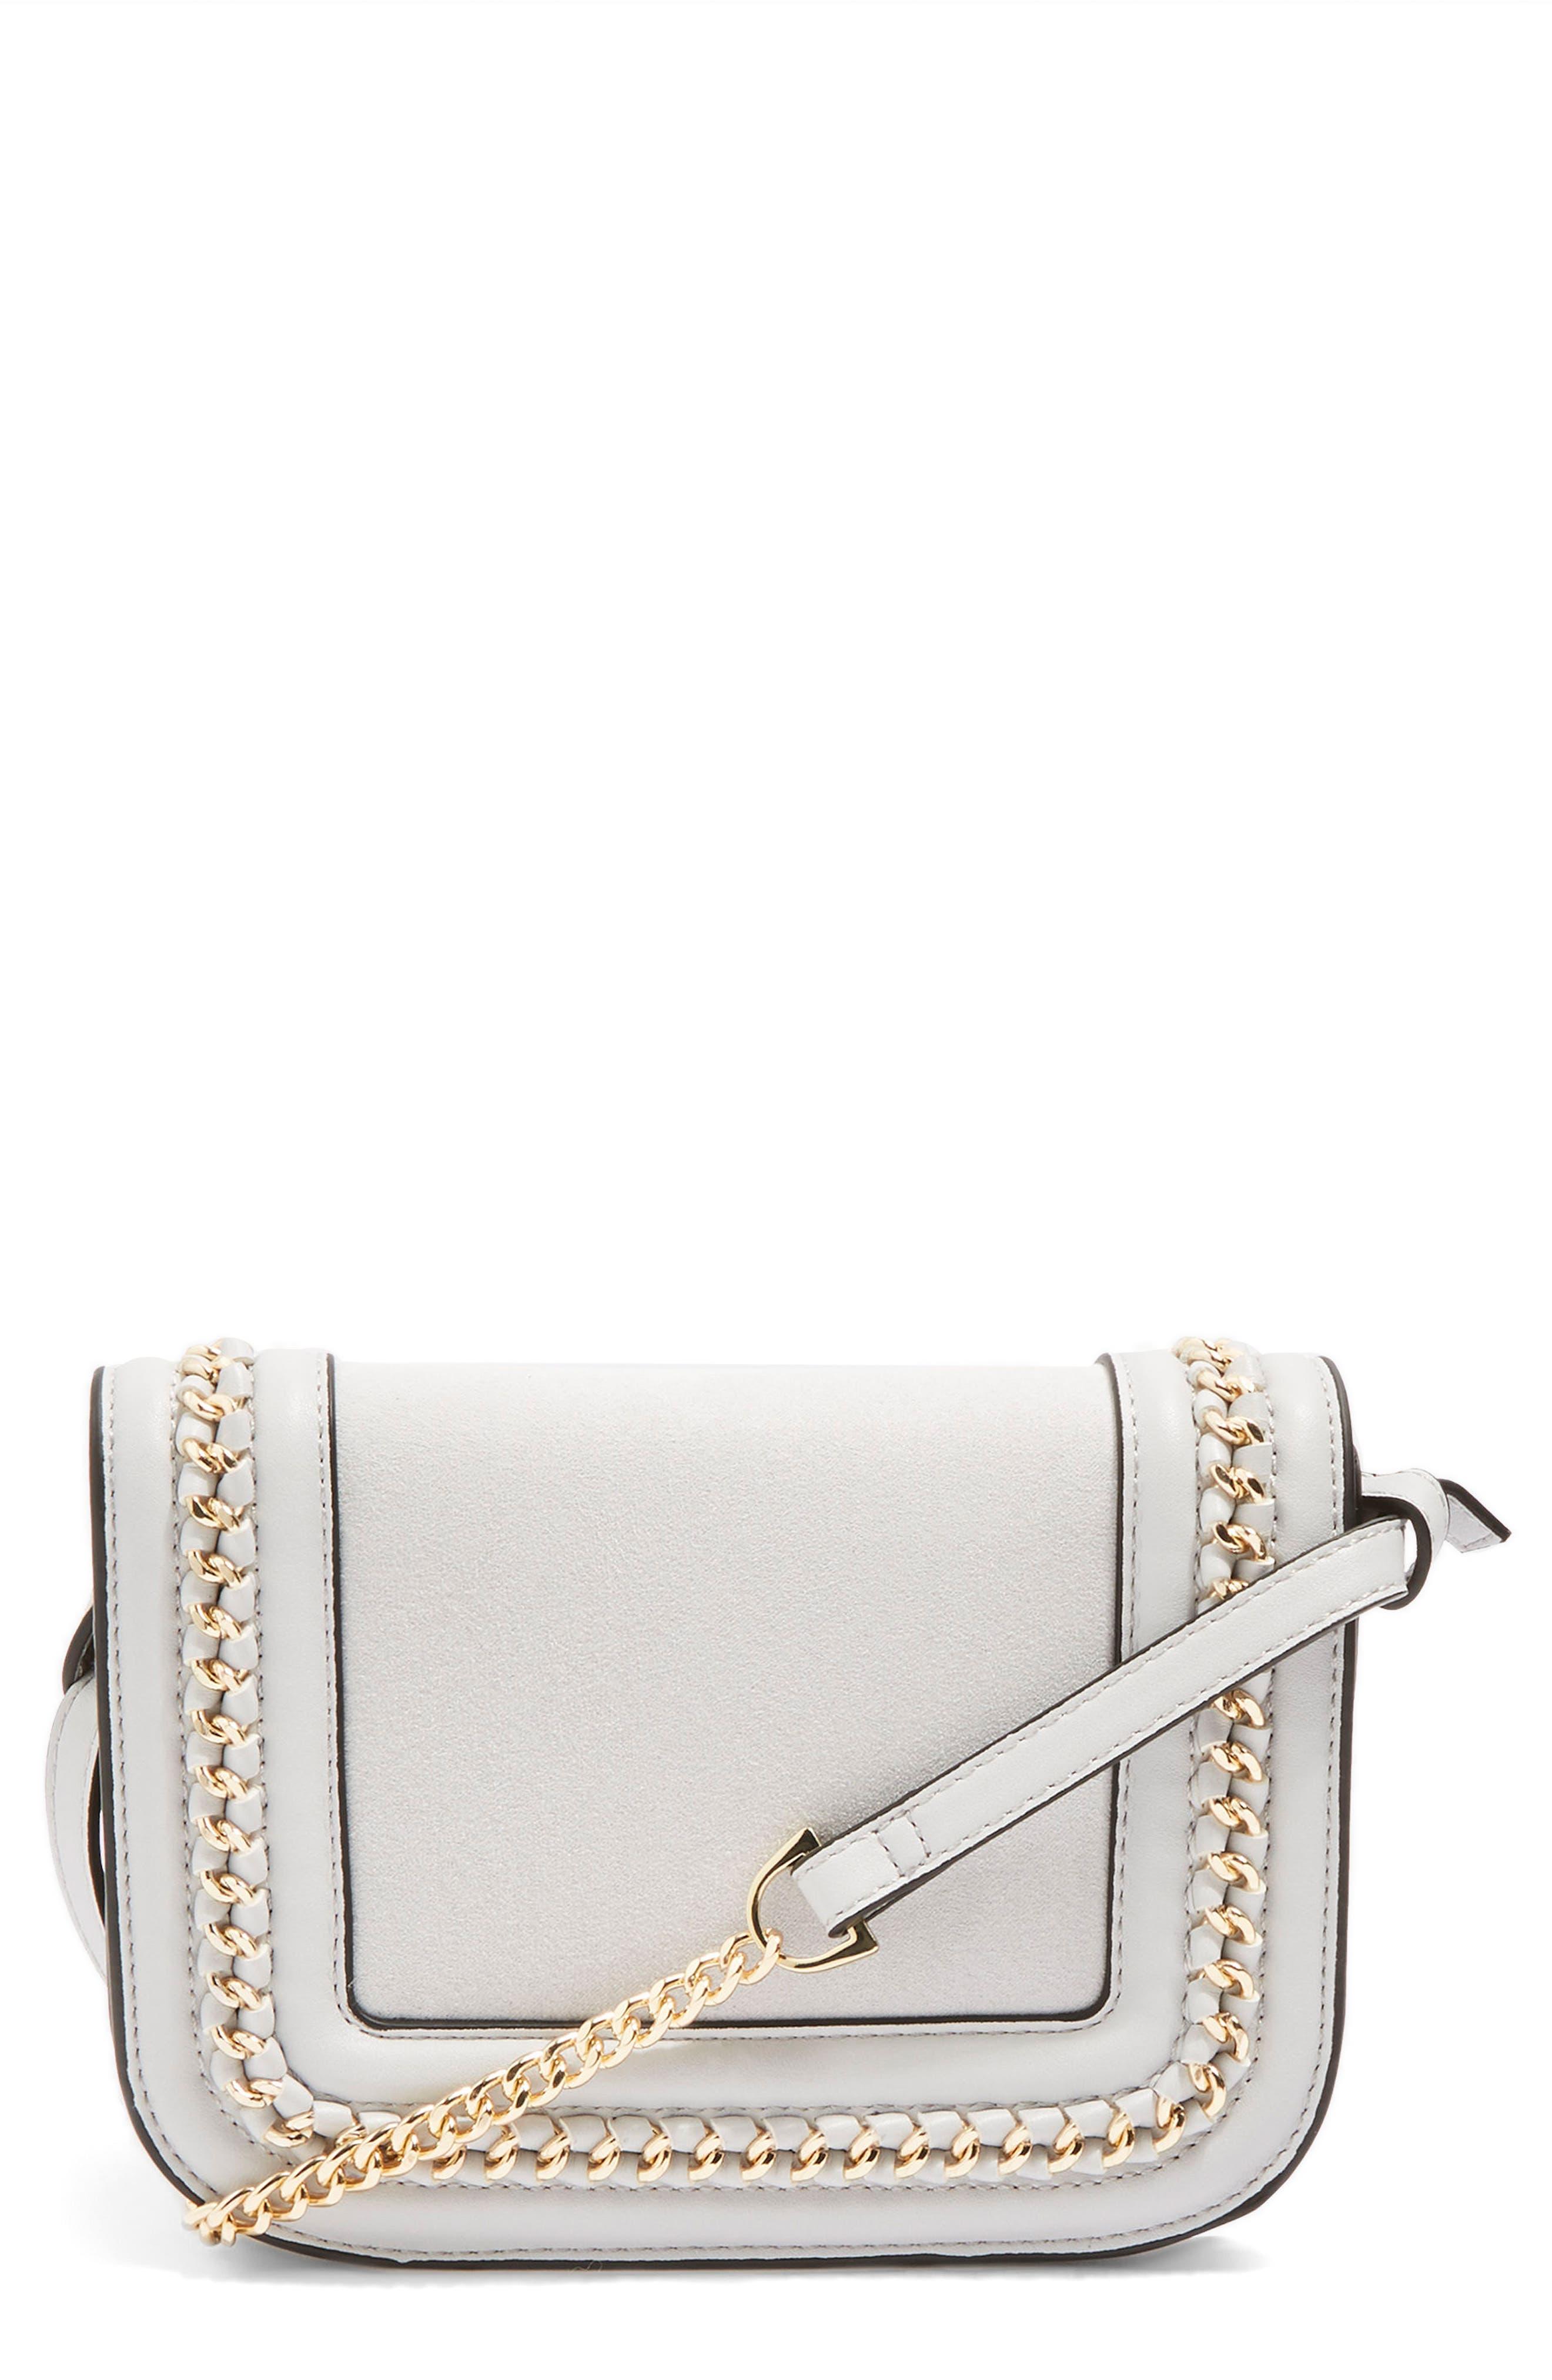 Main Image - Topshop Carmel Chain Flap Crossbody Bag